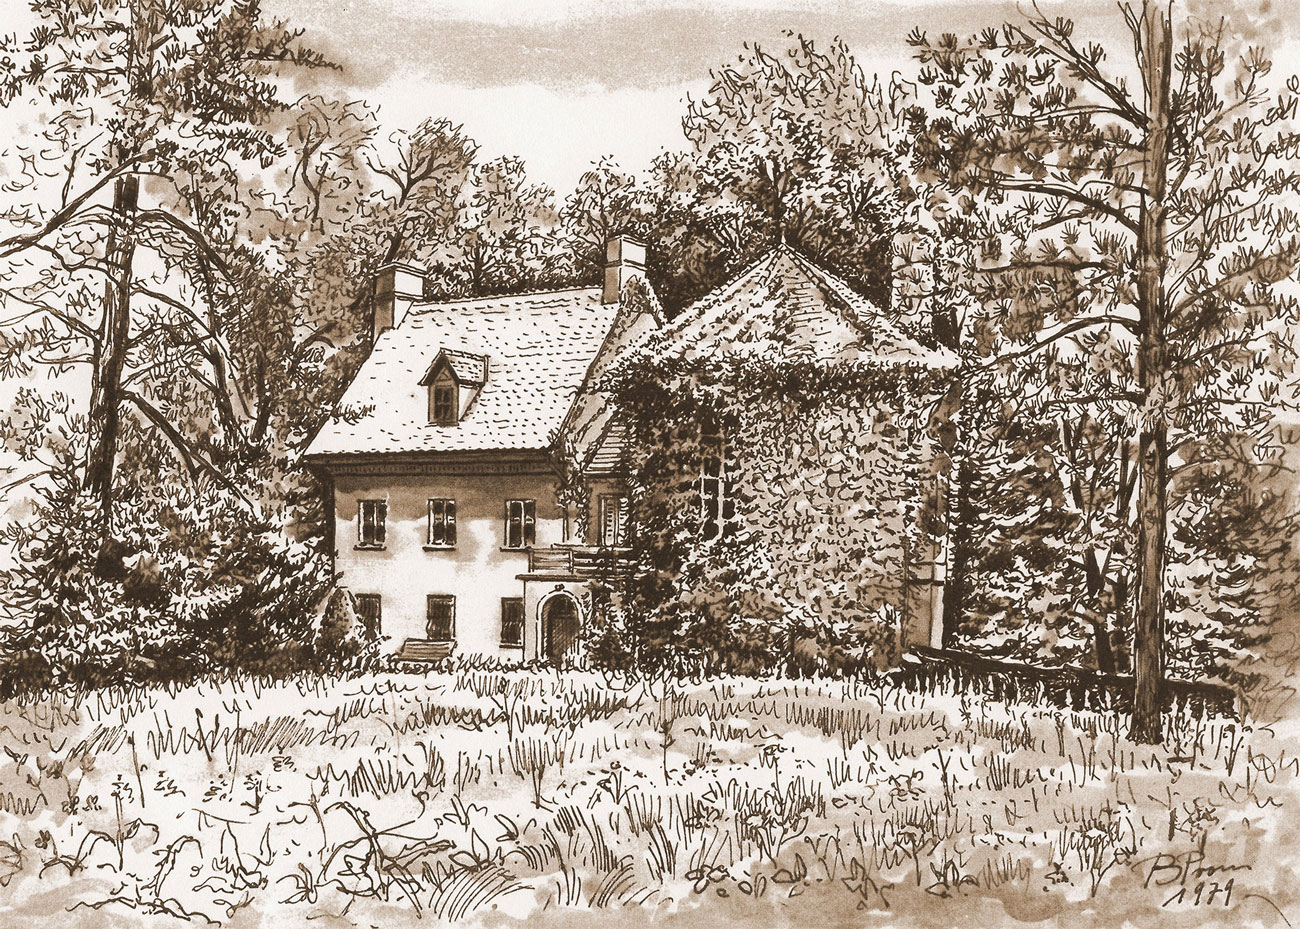 pawilon-arboretum-kornik-1979-prominski-strona